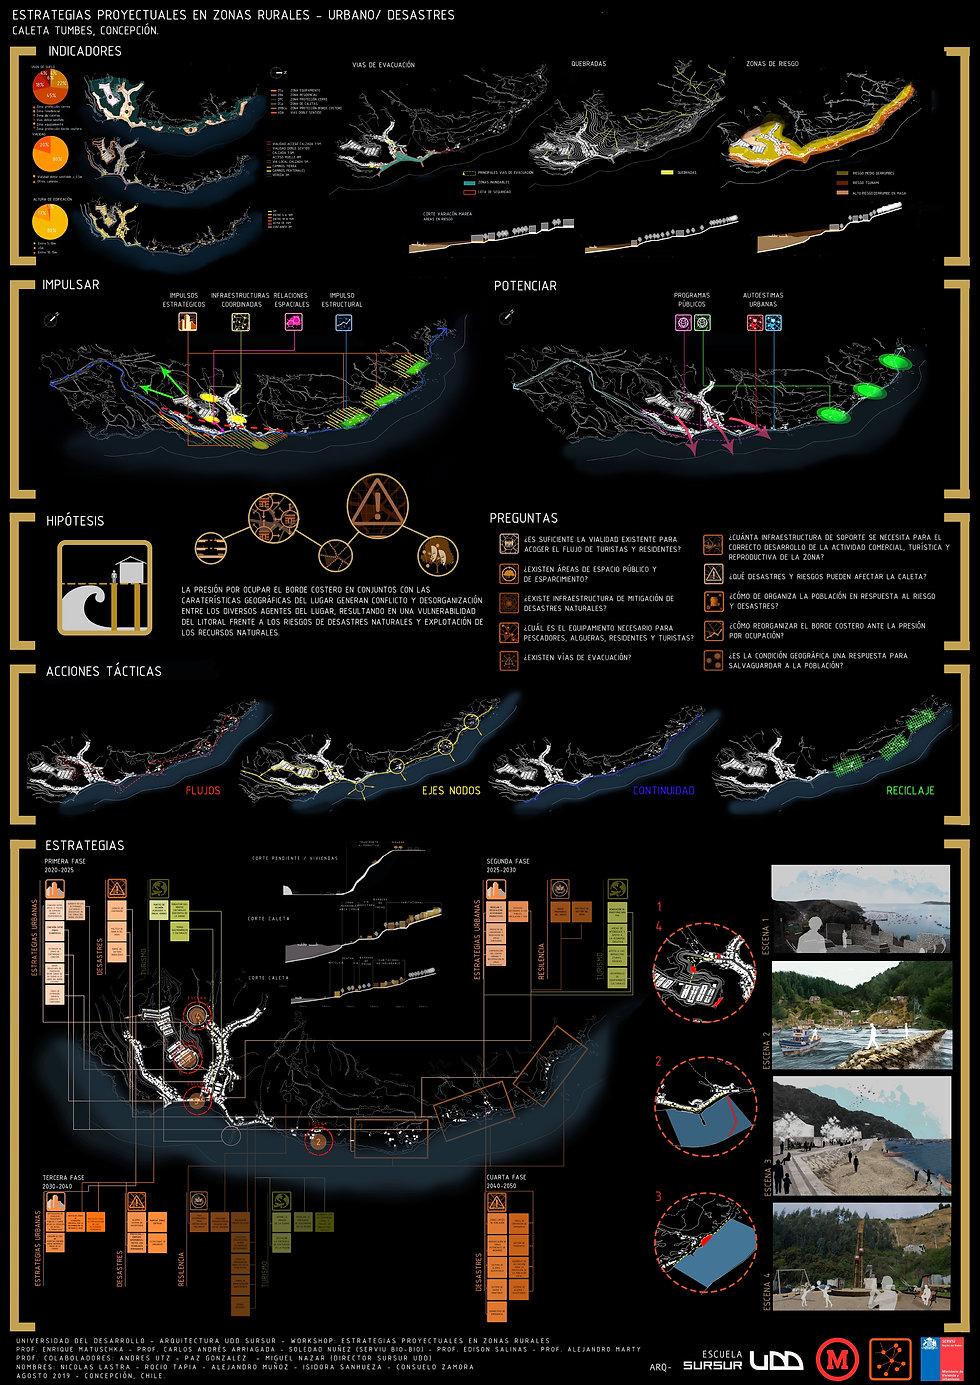 urbano-desastres.pdf_page_1.jpg